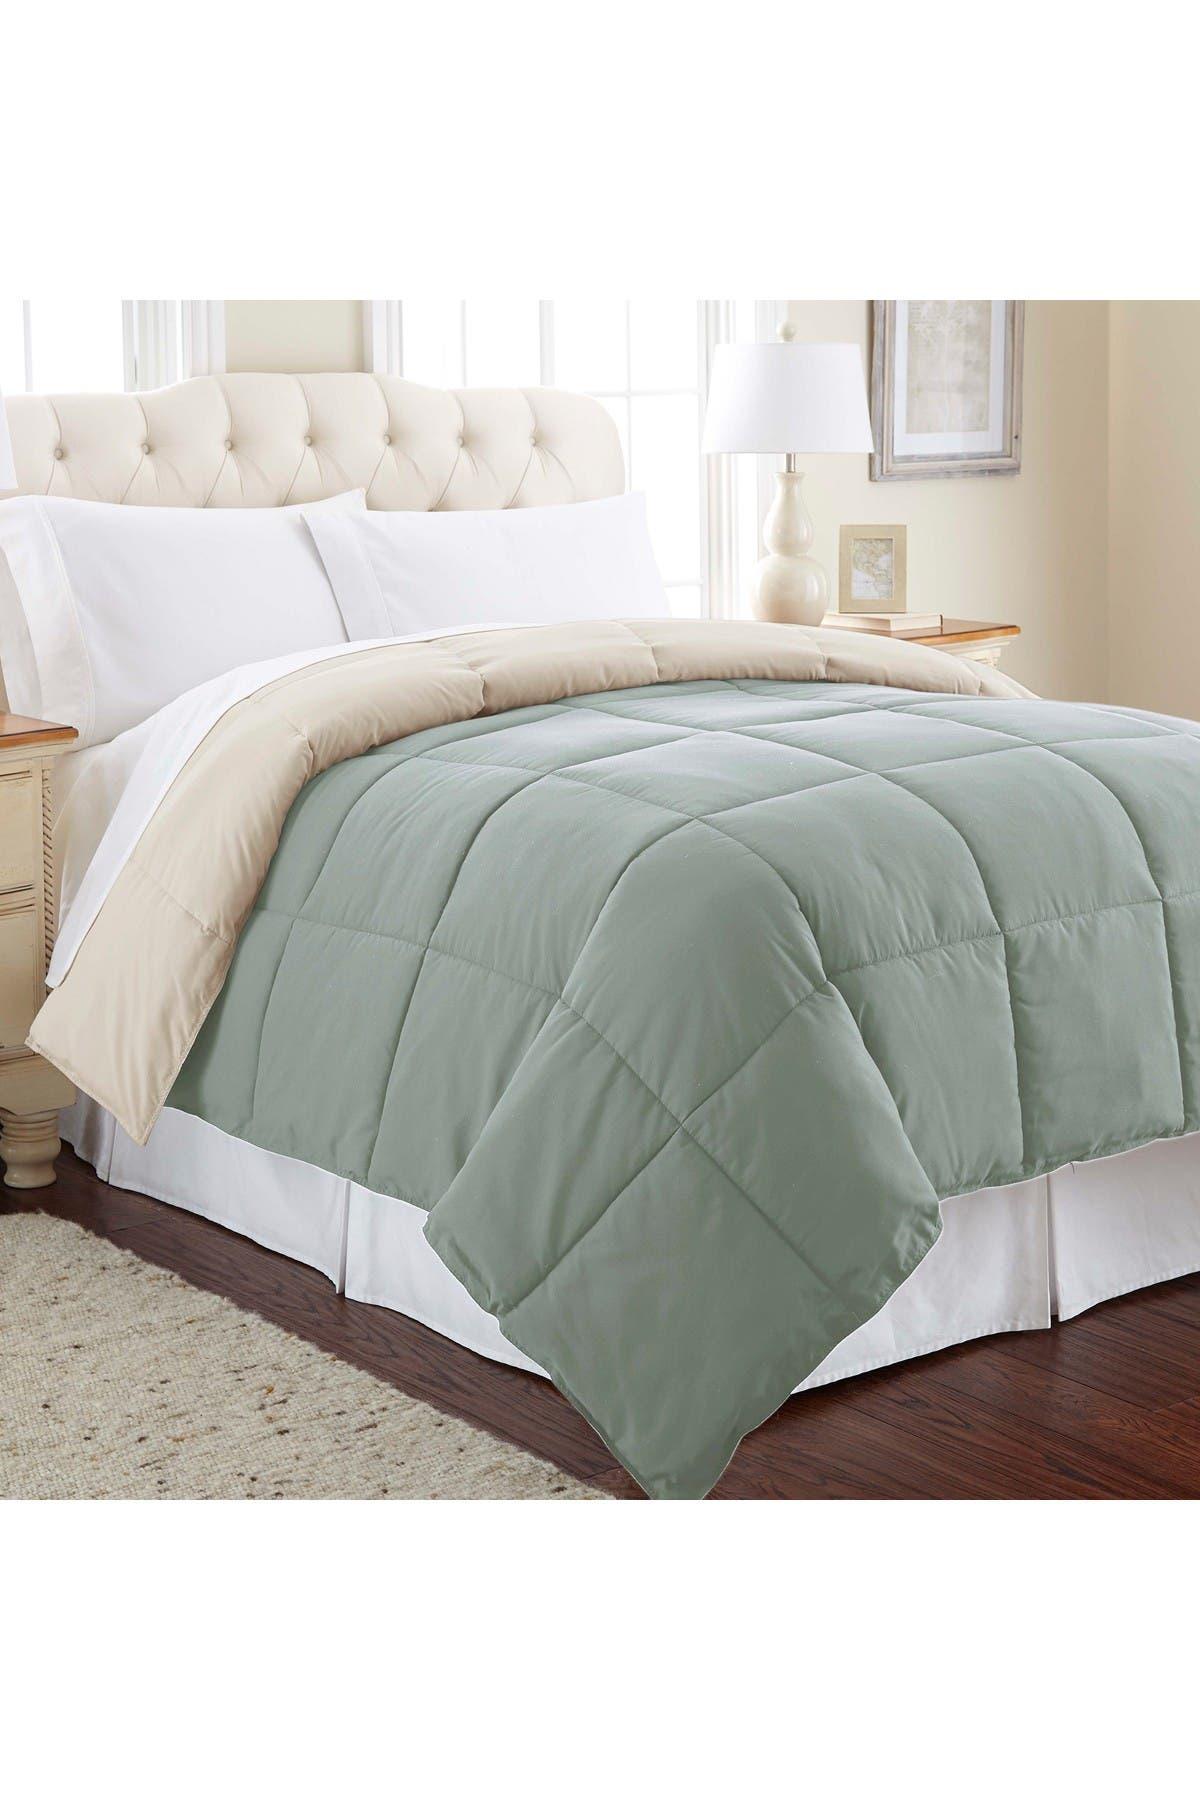 Image of Modern Threads Twin Down Alternative Reversible Comforter - Dusty Sage/Almond